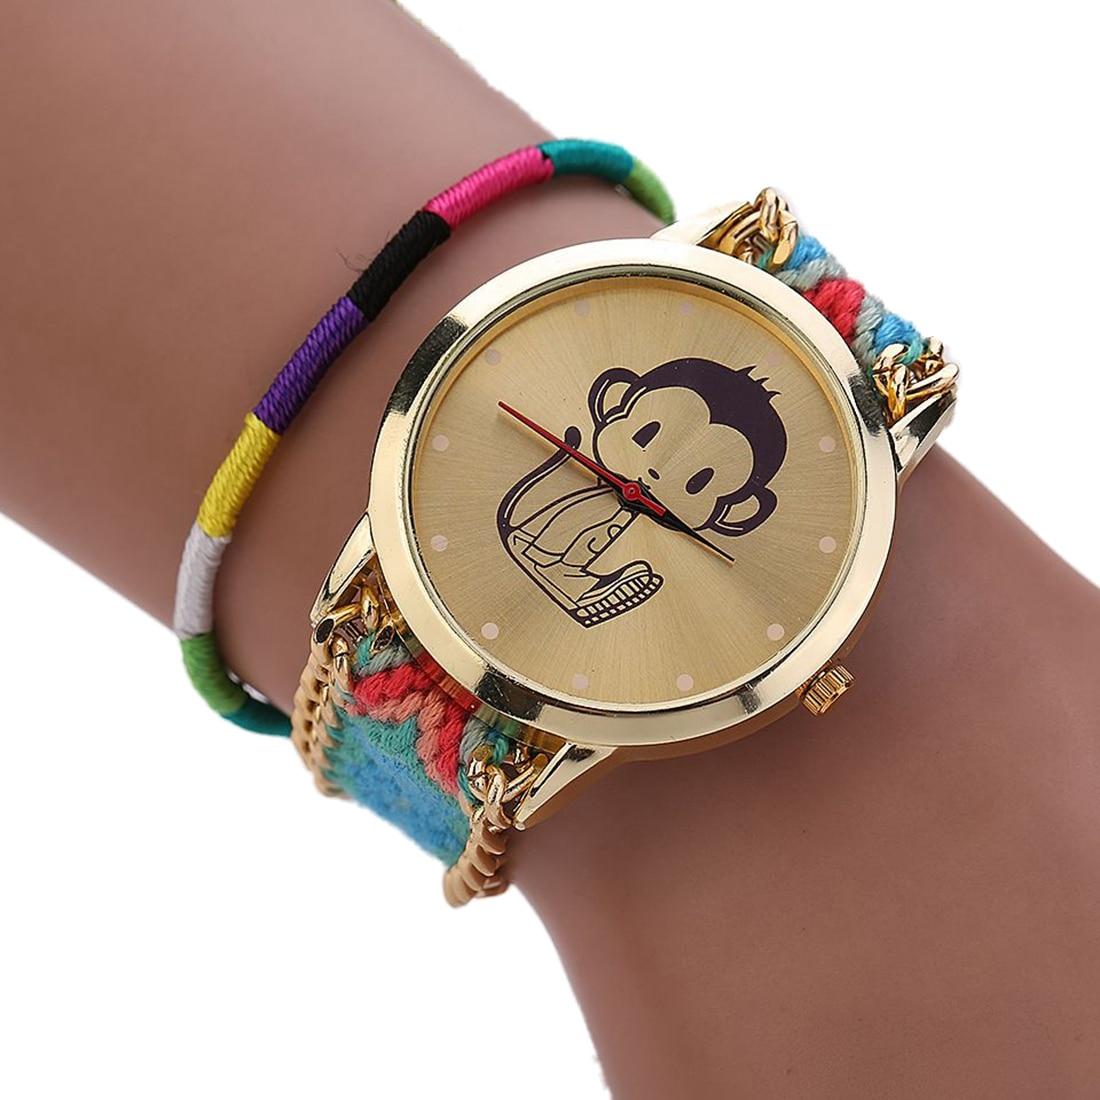 Quartz Watches Woman National Wind Weave Diy Little Monkey Bracelet Watch 3# Latest Fashion